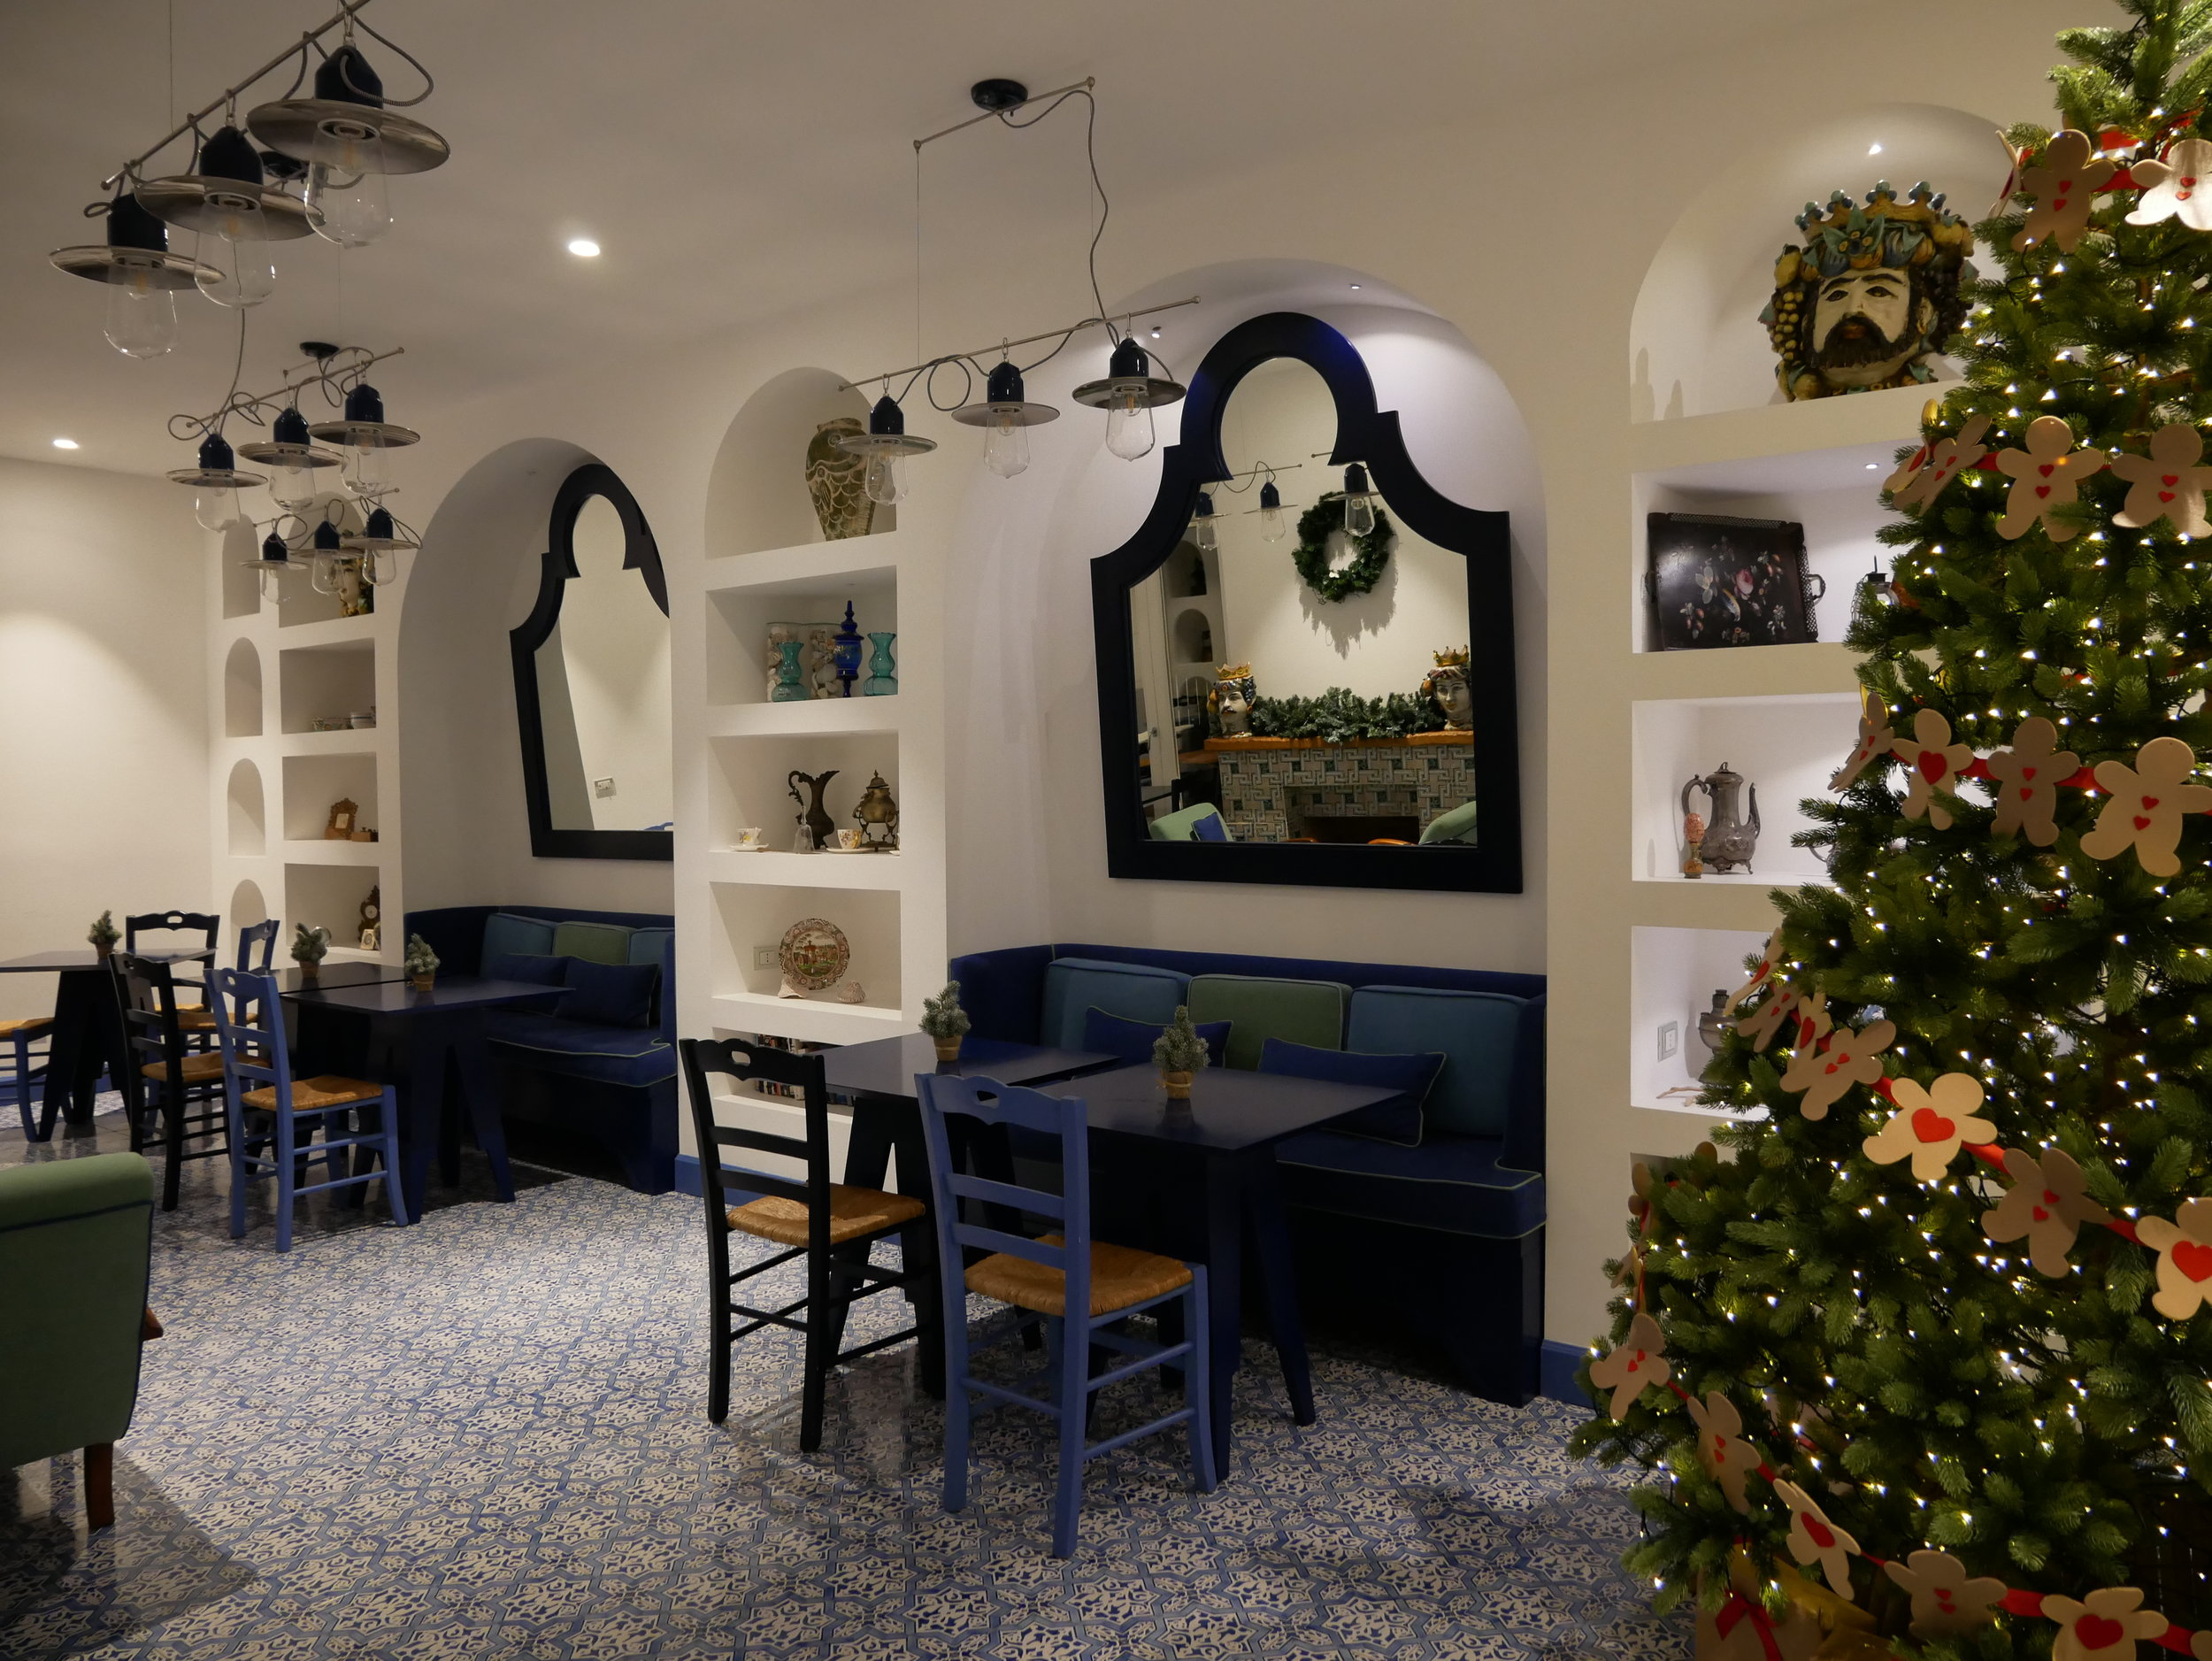 Hotel Mignon Sorrento breakfast room.jpg